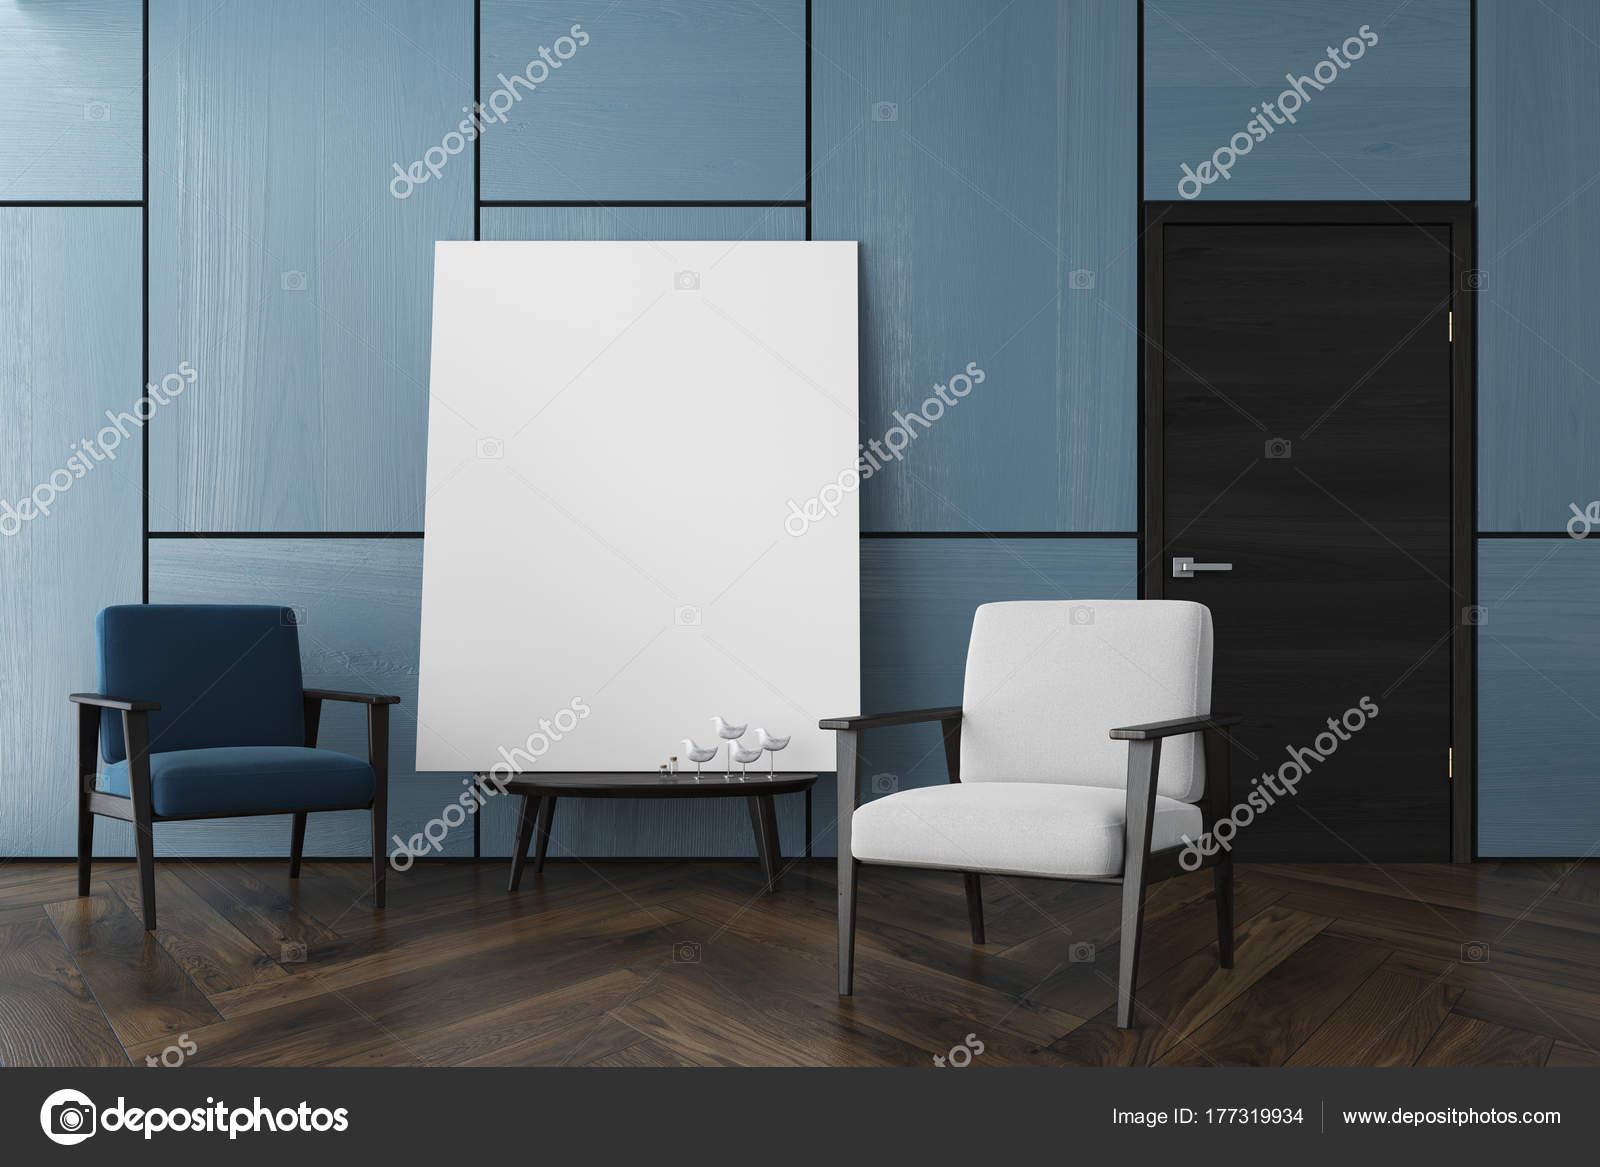 https://st3.depositphotos.com/2673929/17731/i/1600/depositphotos_177319934-stockafbeelding-blue-woonkamer-twee-fauteuils-poster.jpg